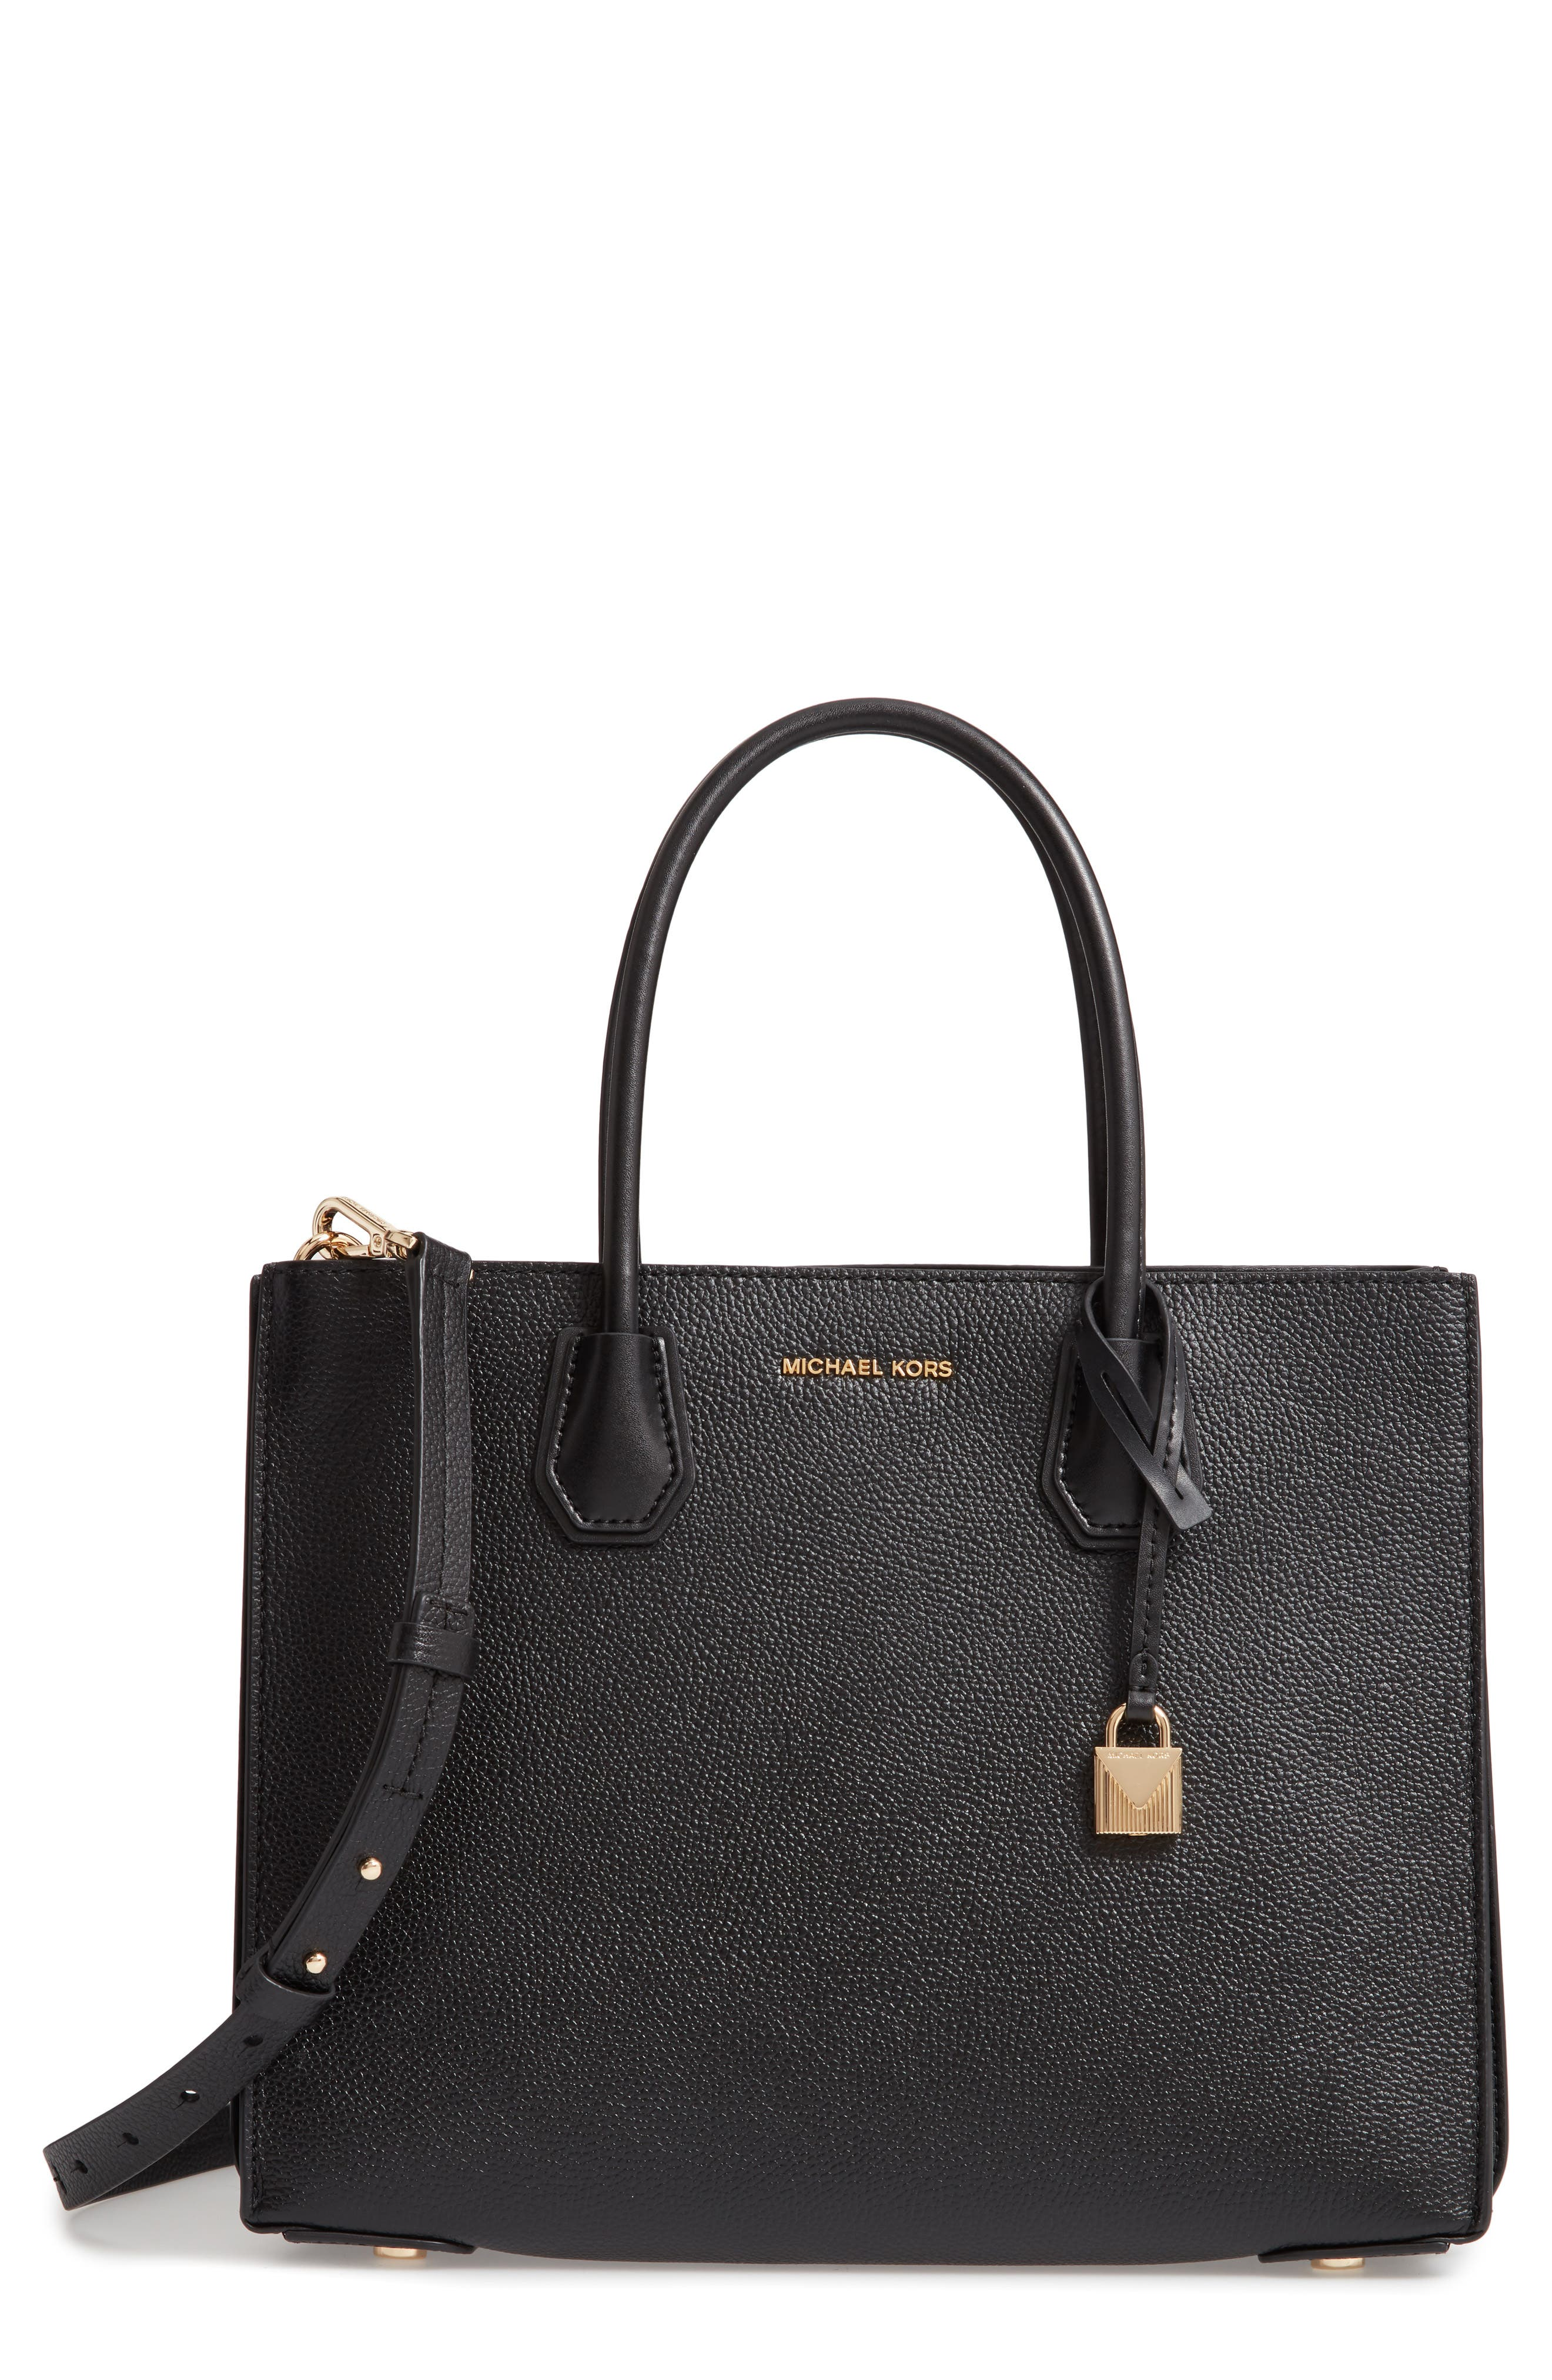 Michael Kors Handbags Nordstrom Selma Medium Lilac Authentic